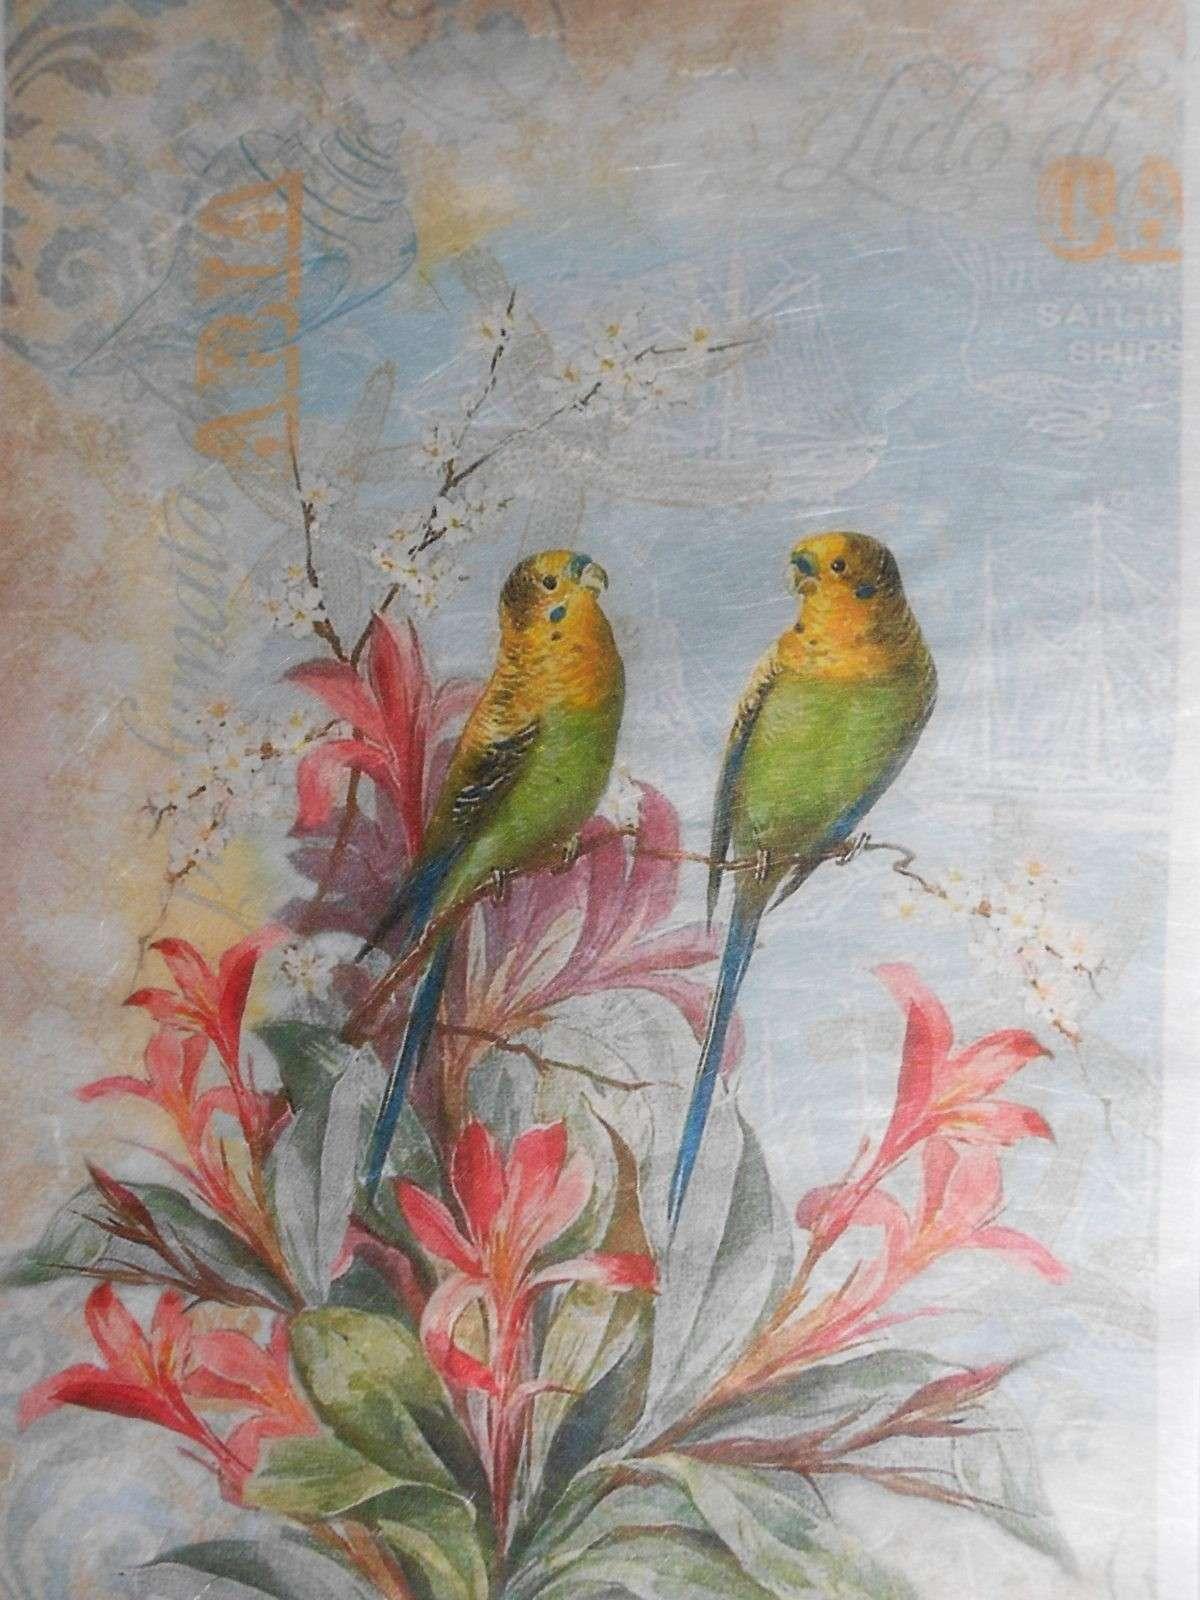 Green Yellow Canary Birds Decoupage Rice Paper Decoupage